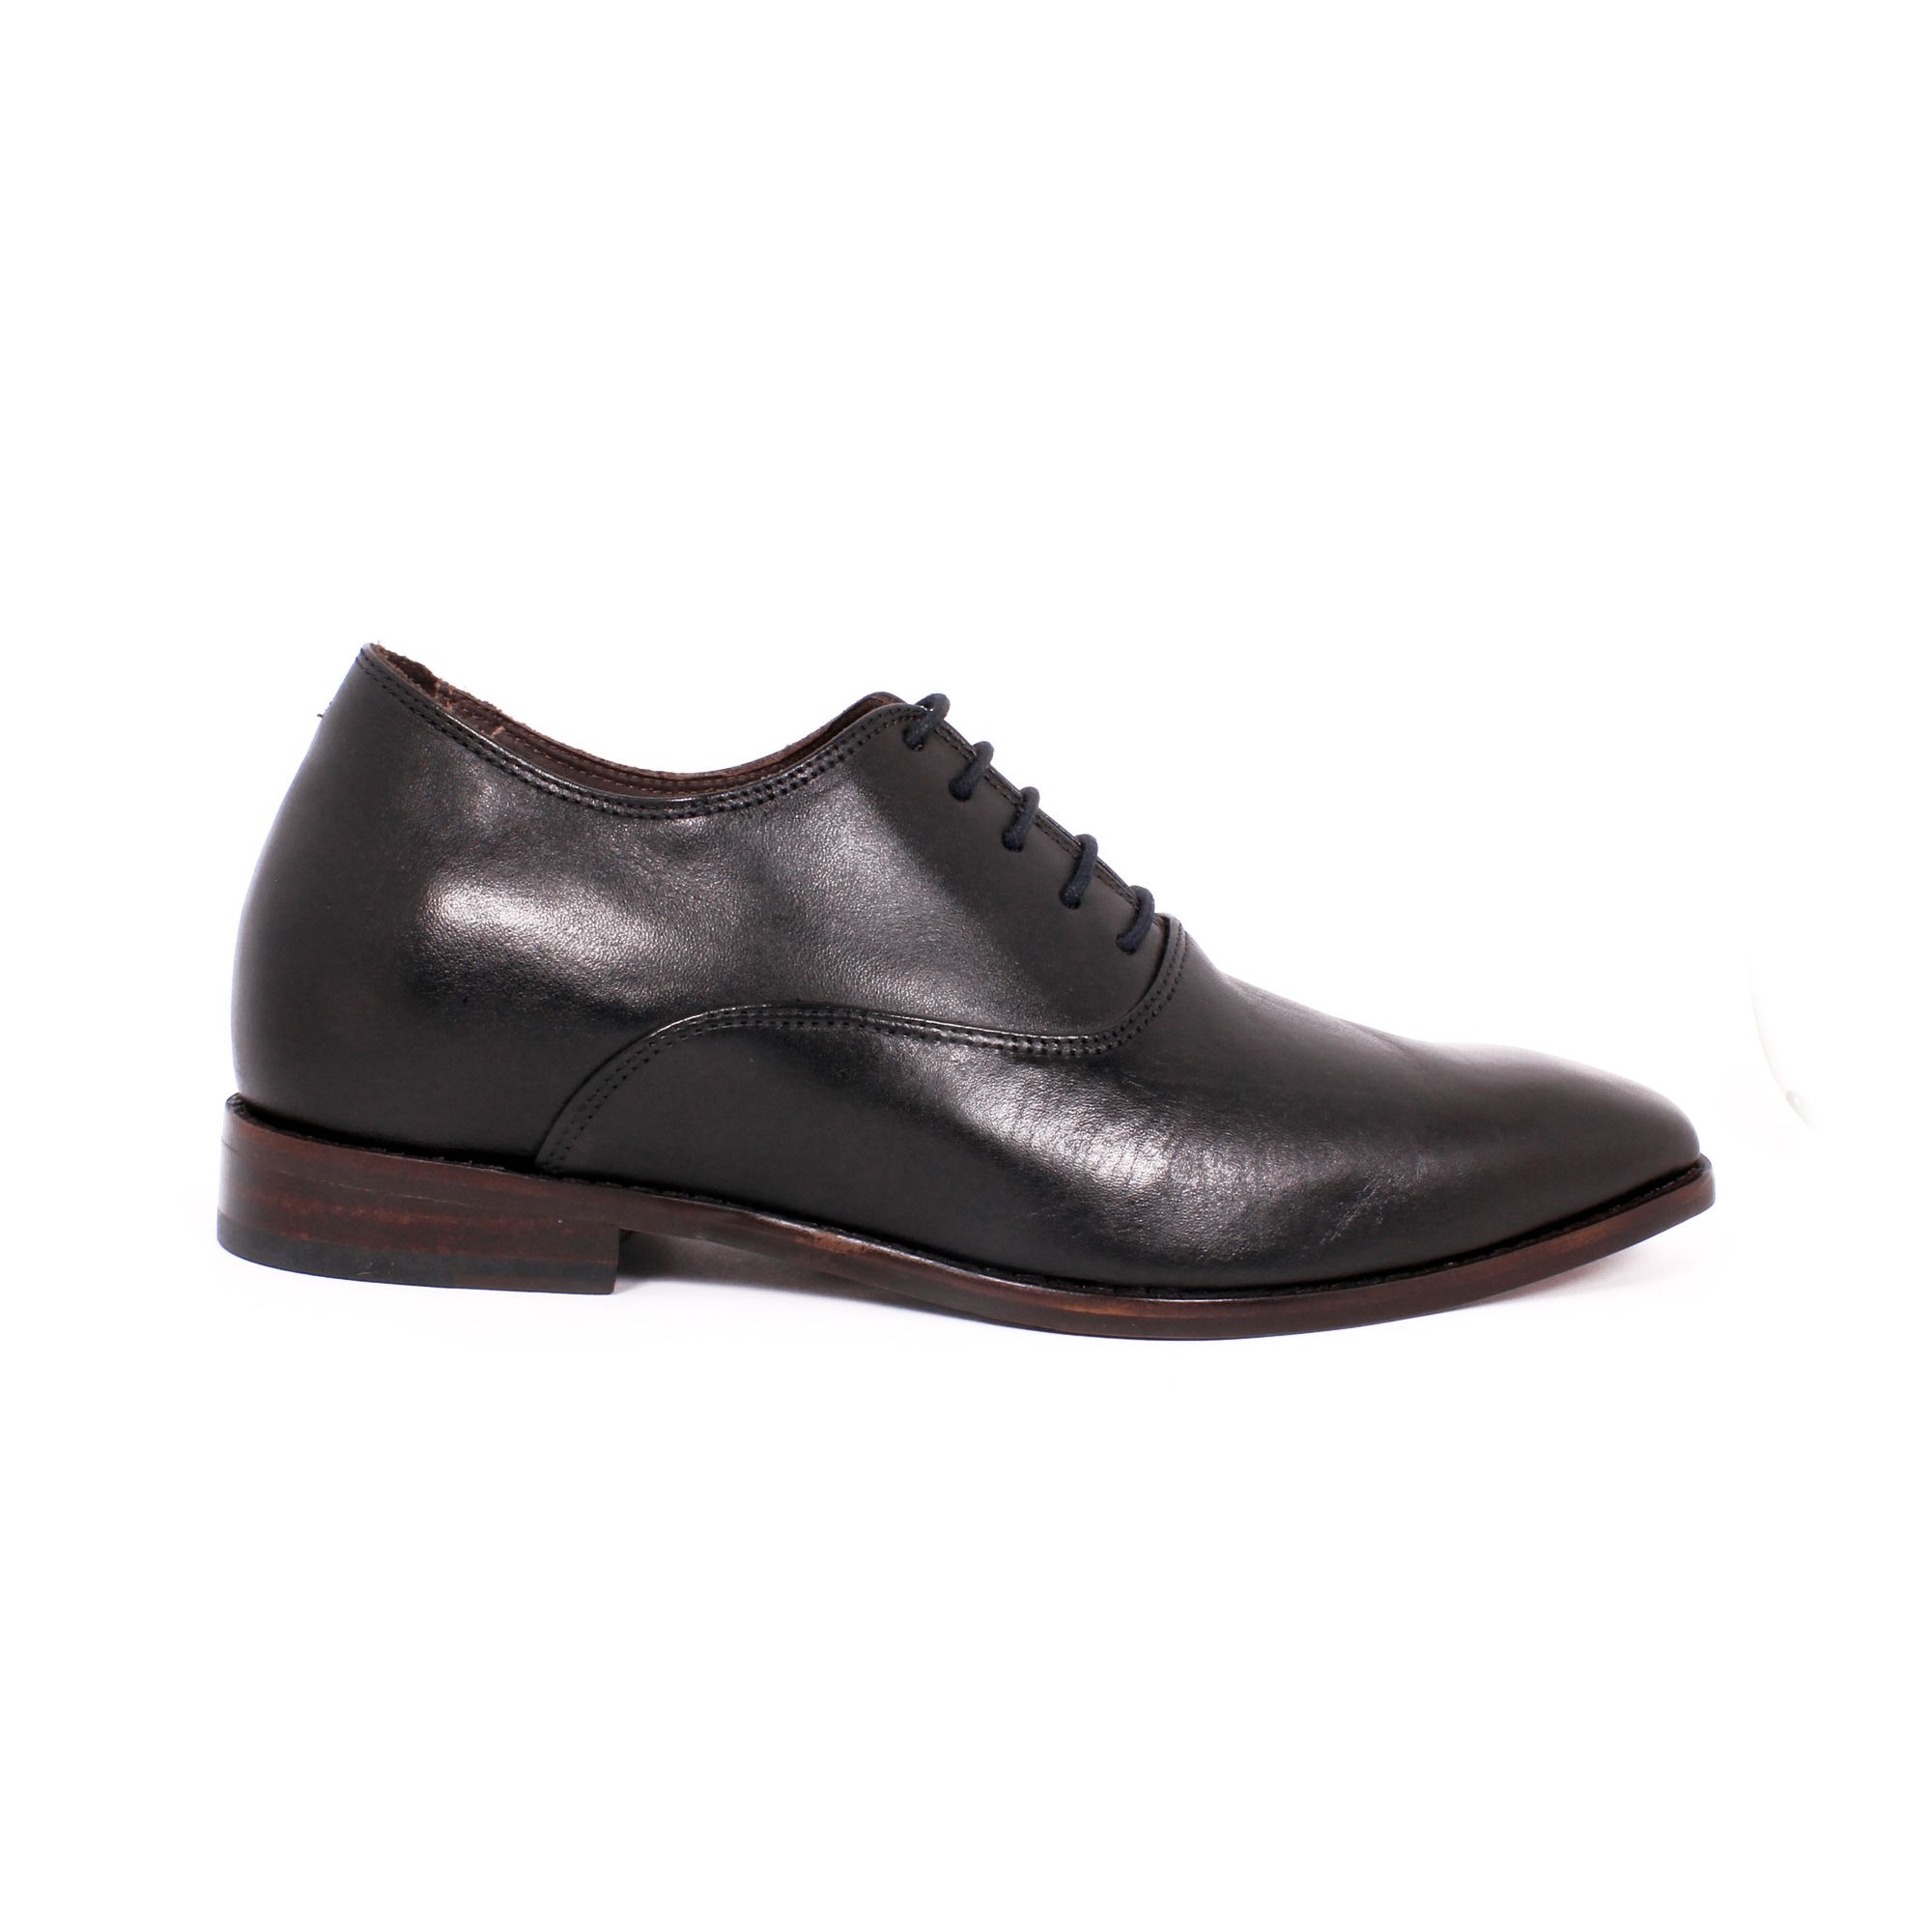 Zapato Formal Elegant Negro Max Denegri +7cm de Altura_70798